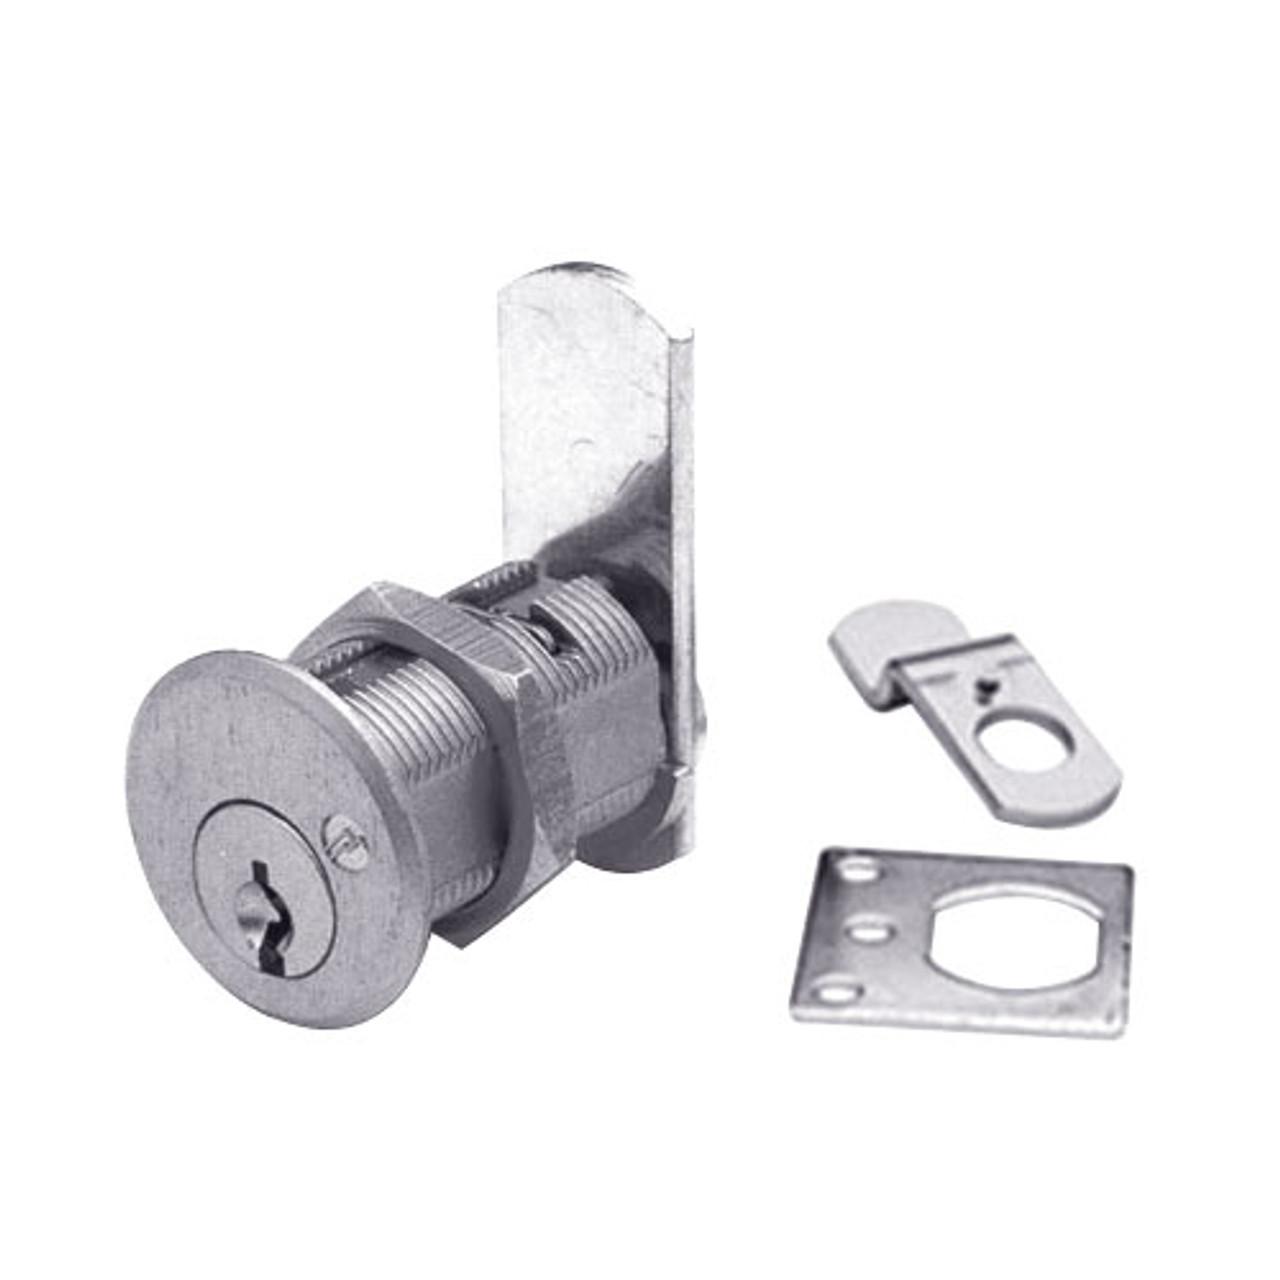 Olympus DCR3-KD-26D Cam Locks in Satin Chrome Finish